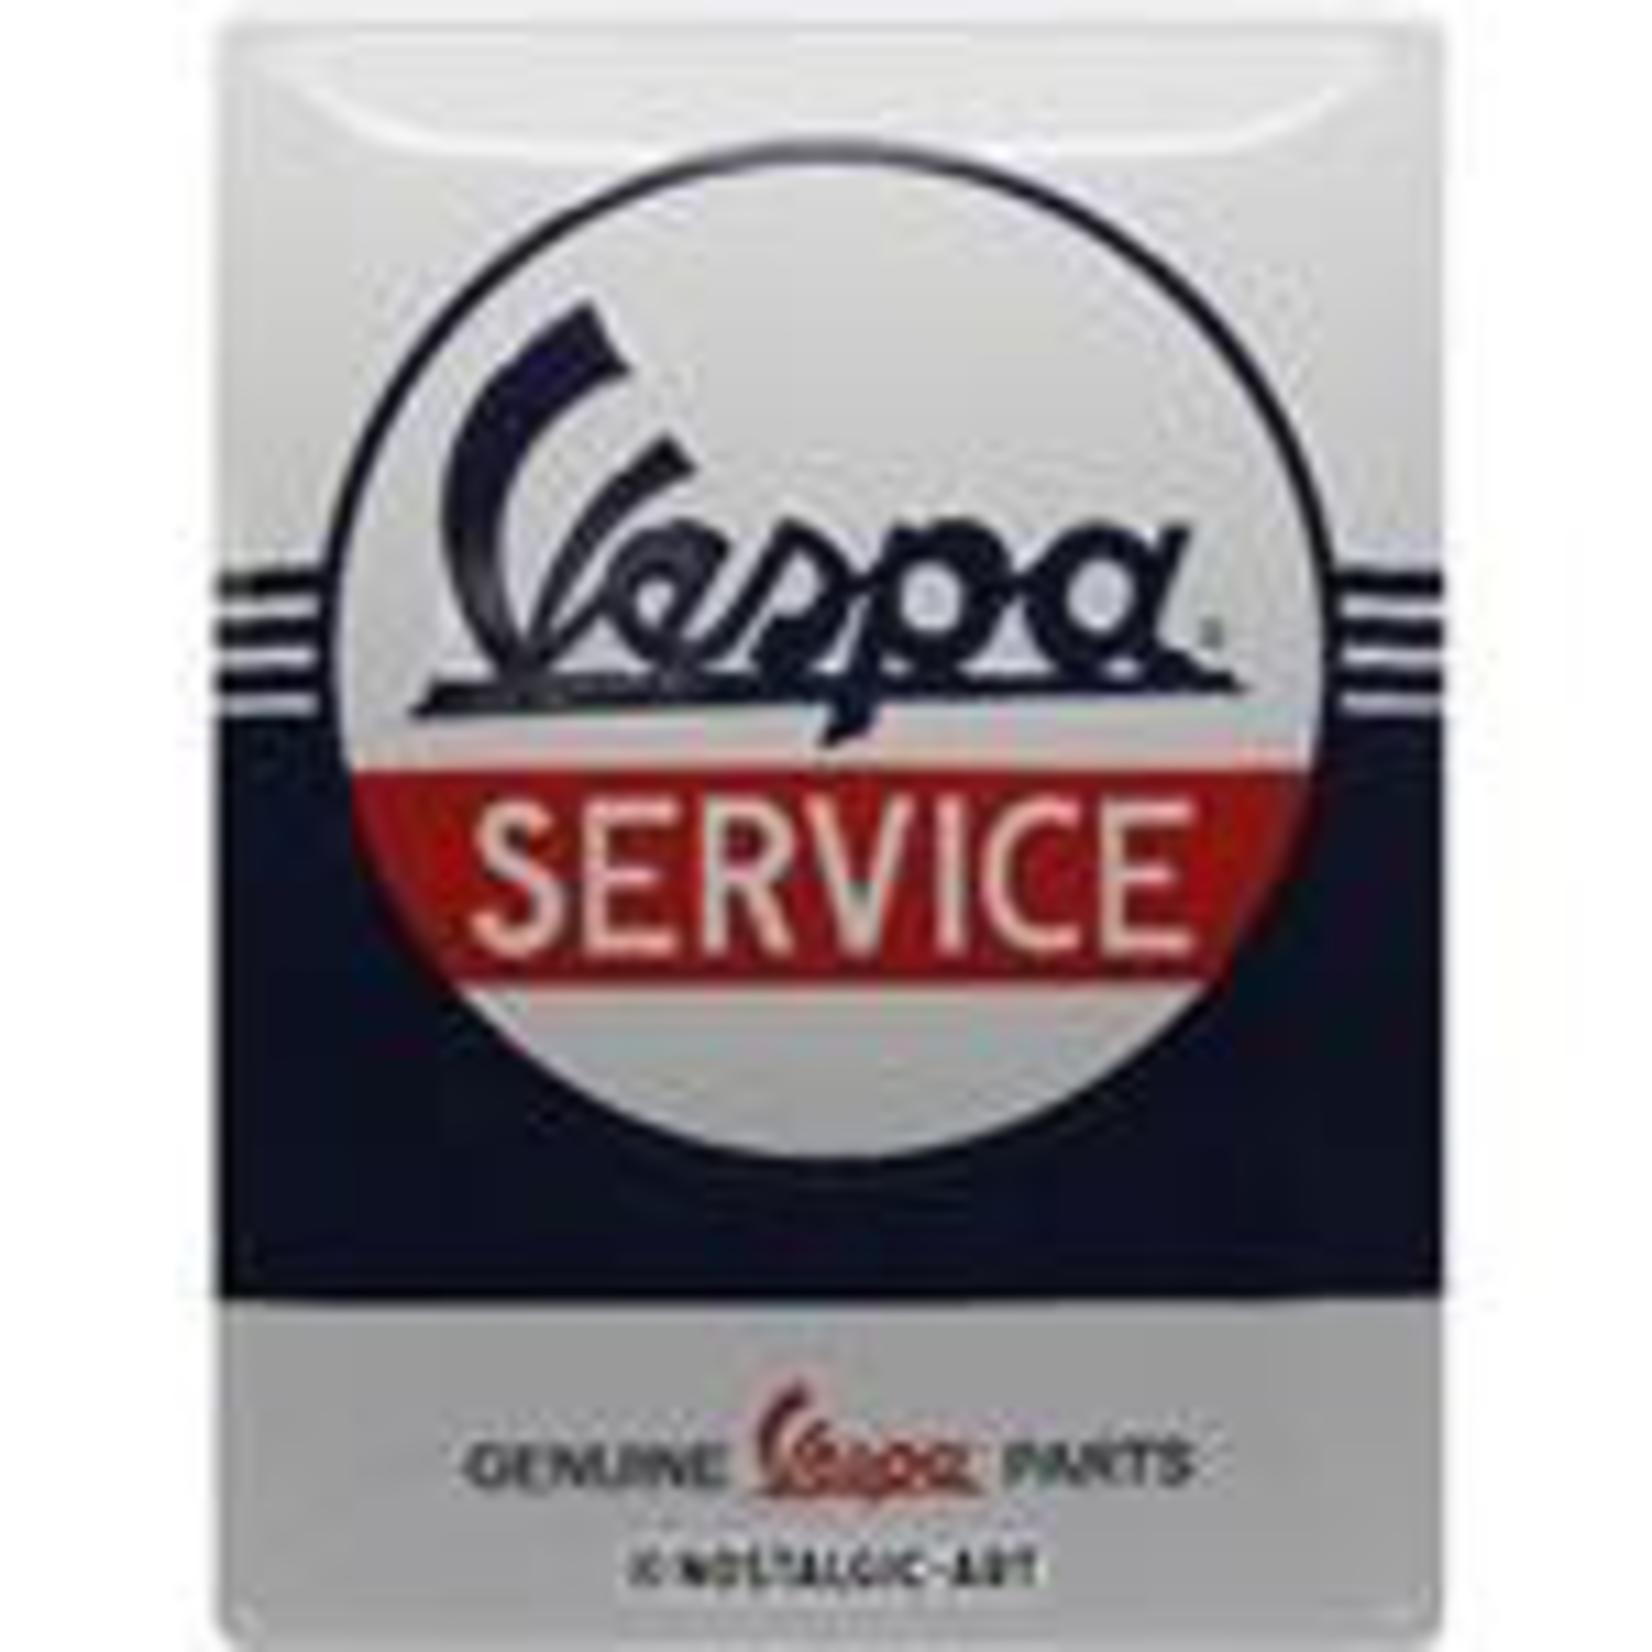 Lifestyle Sign, Vespa Service White/Blue/Red 15 x 20 cm